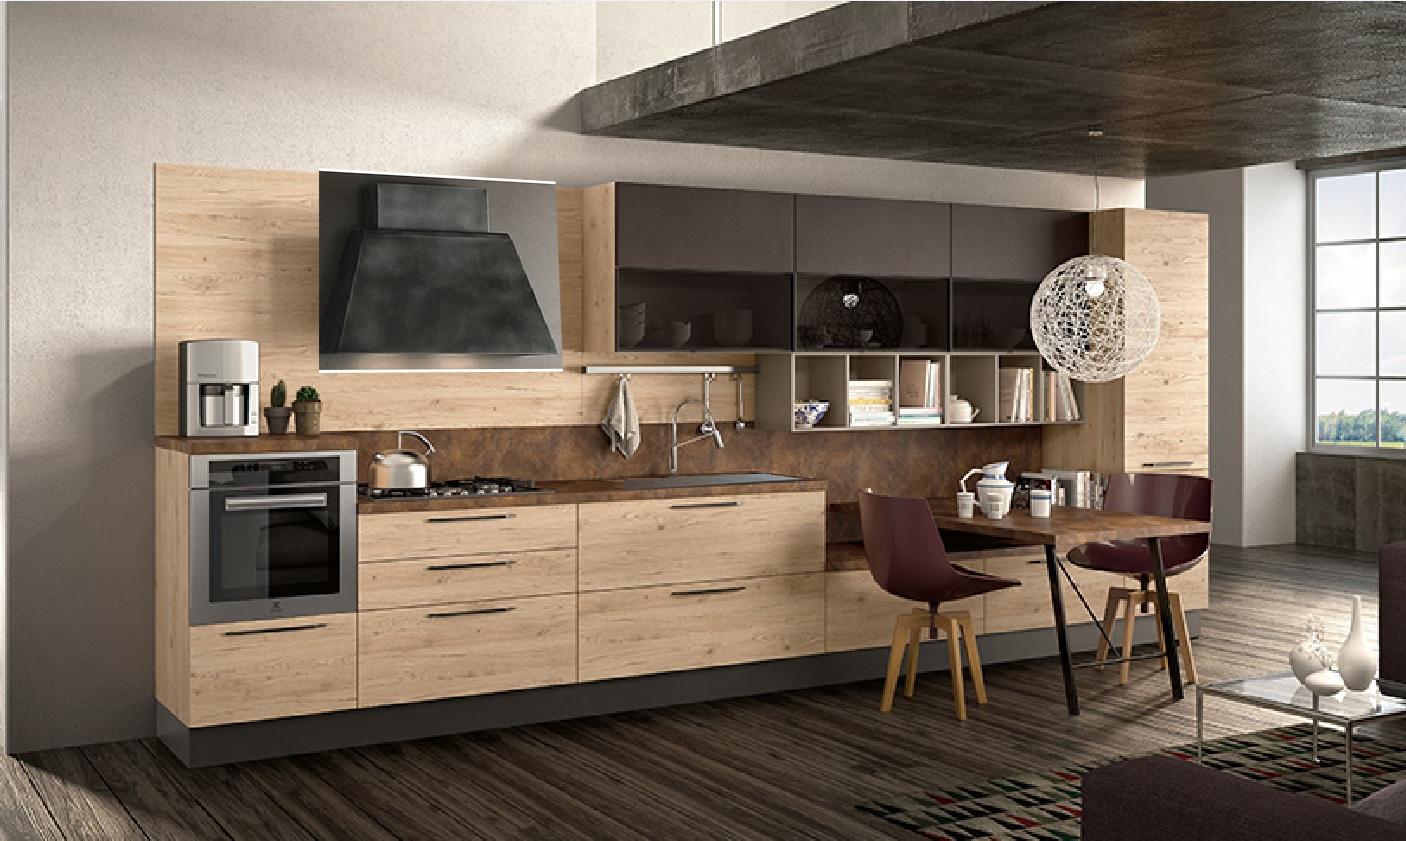 Cucina nuovi mondi cucine cucina moderna industrial in for Cucine outlet